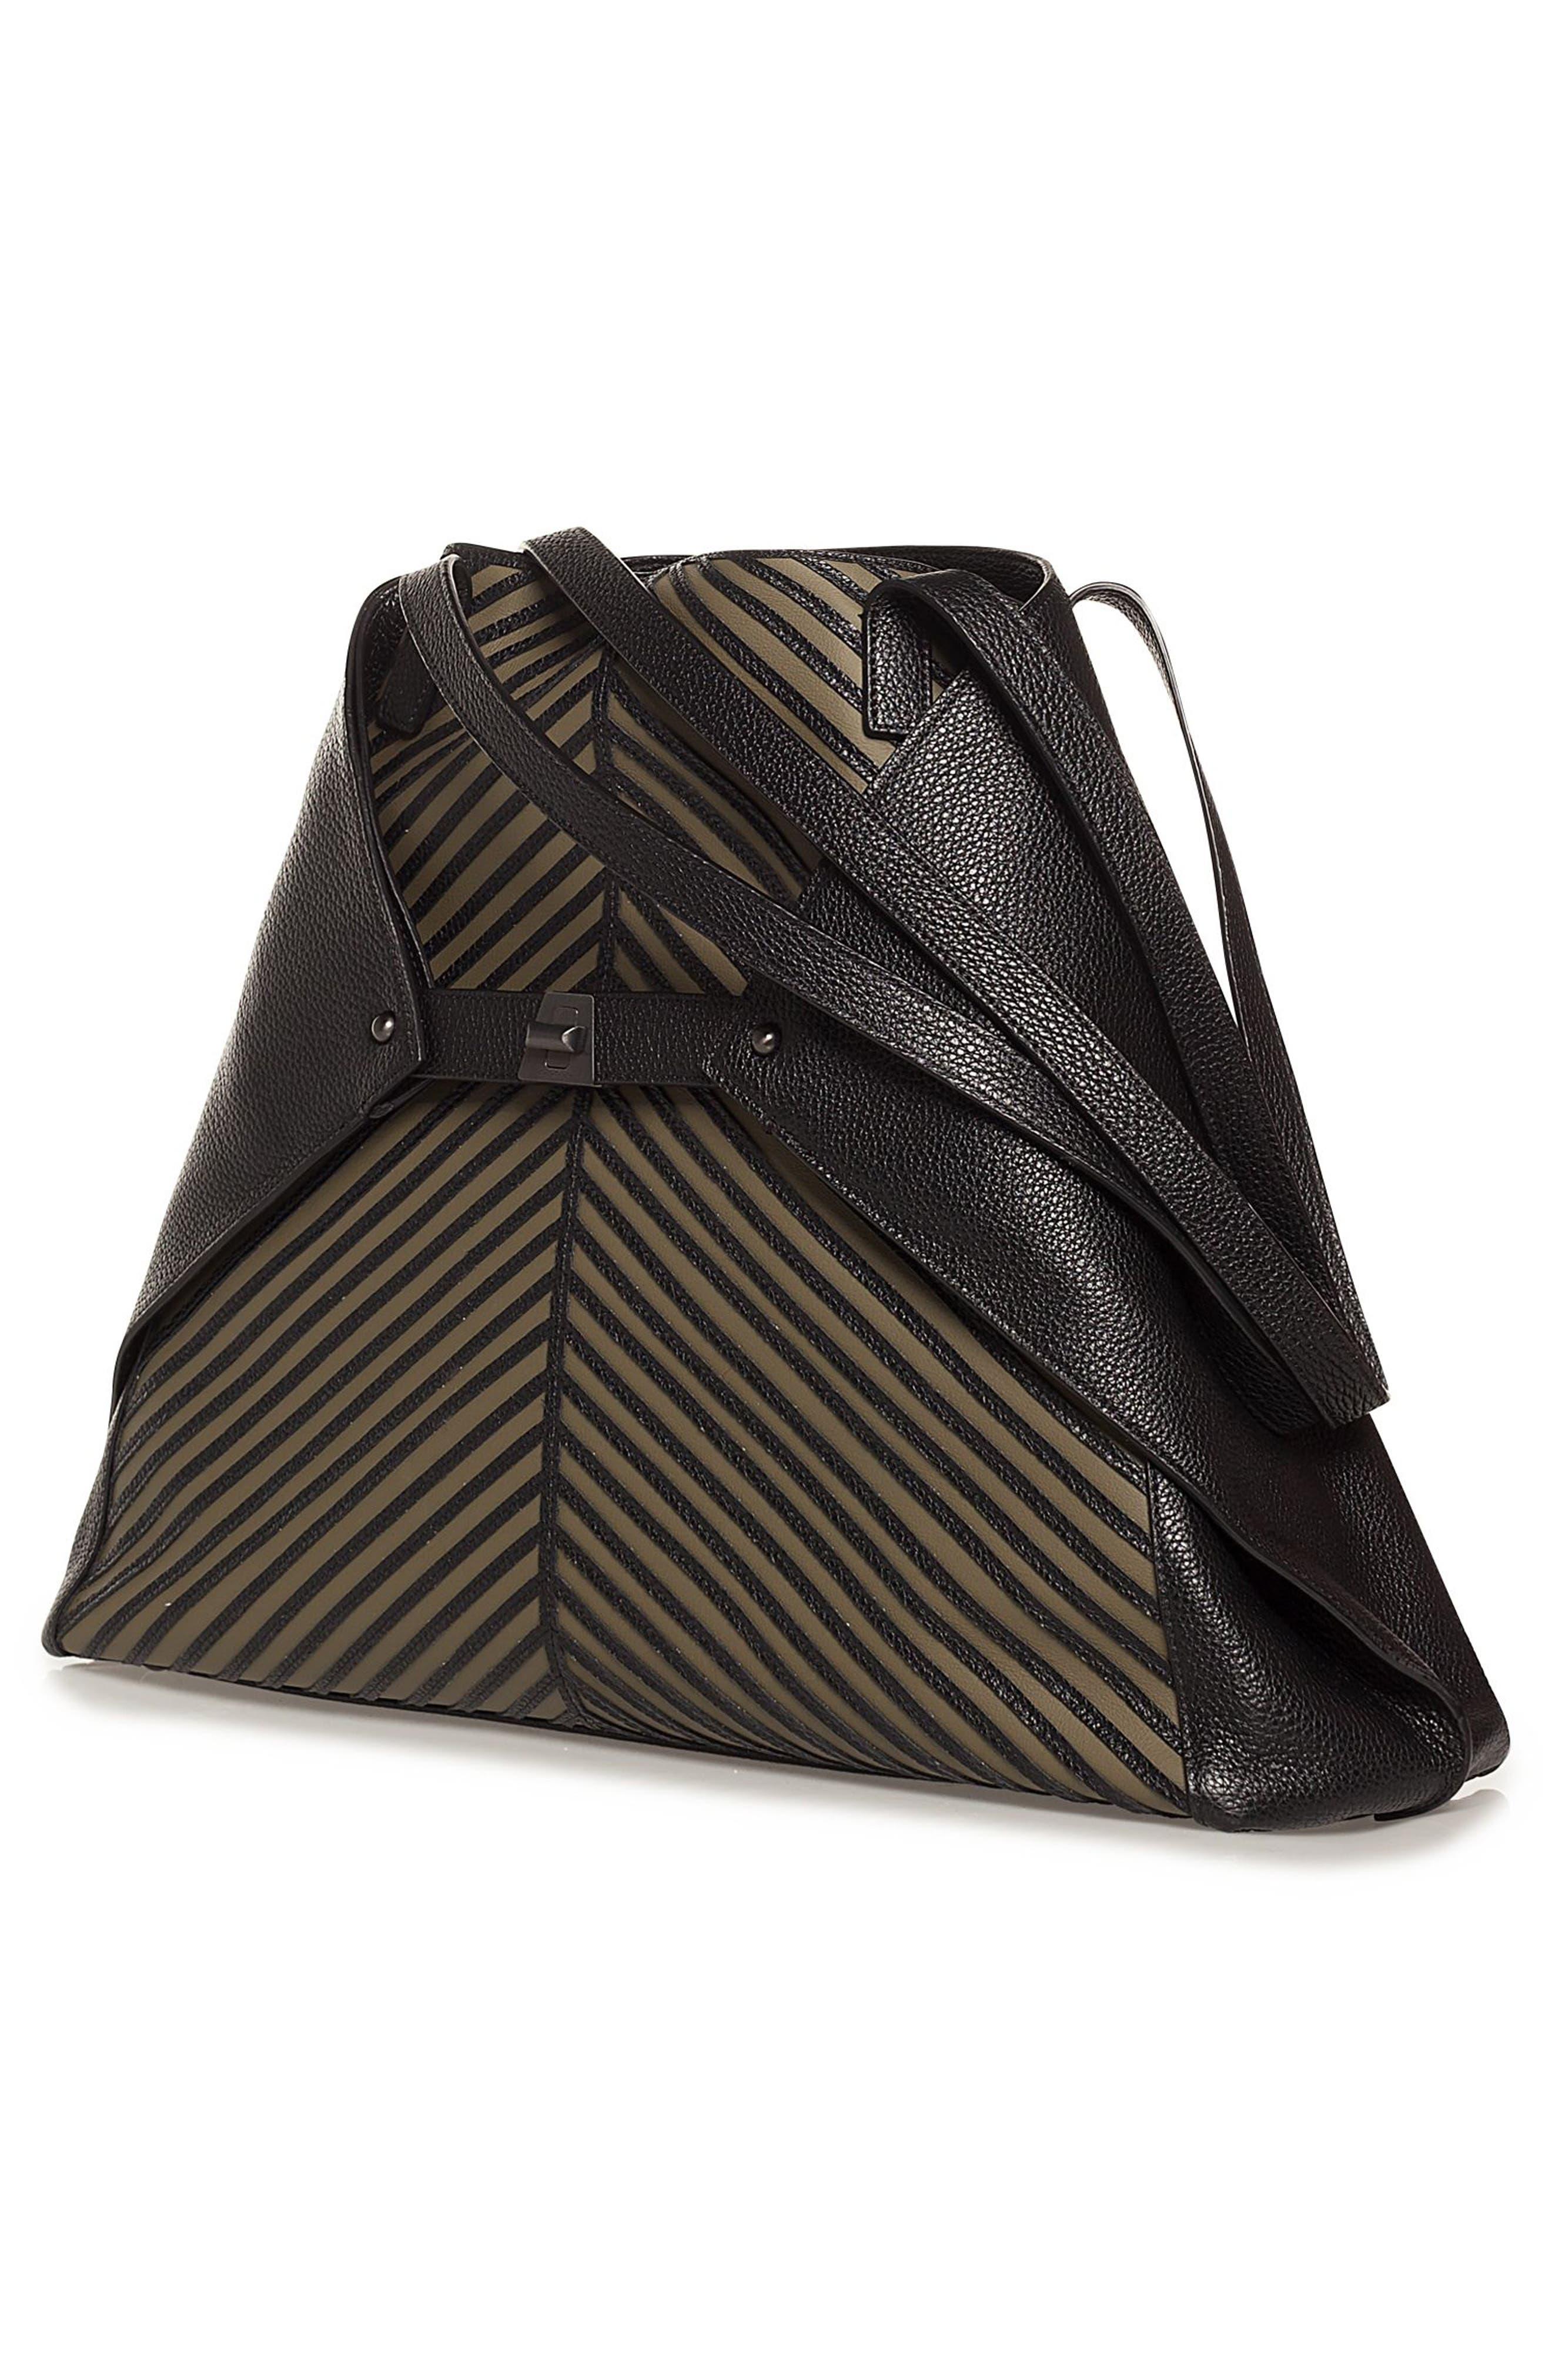 Medium AI Leather Tote,                             Alternate thumbnail 4, color,                             Olive/ Black